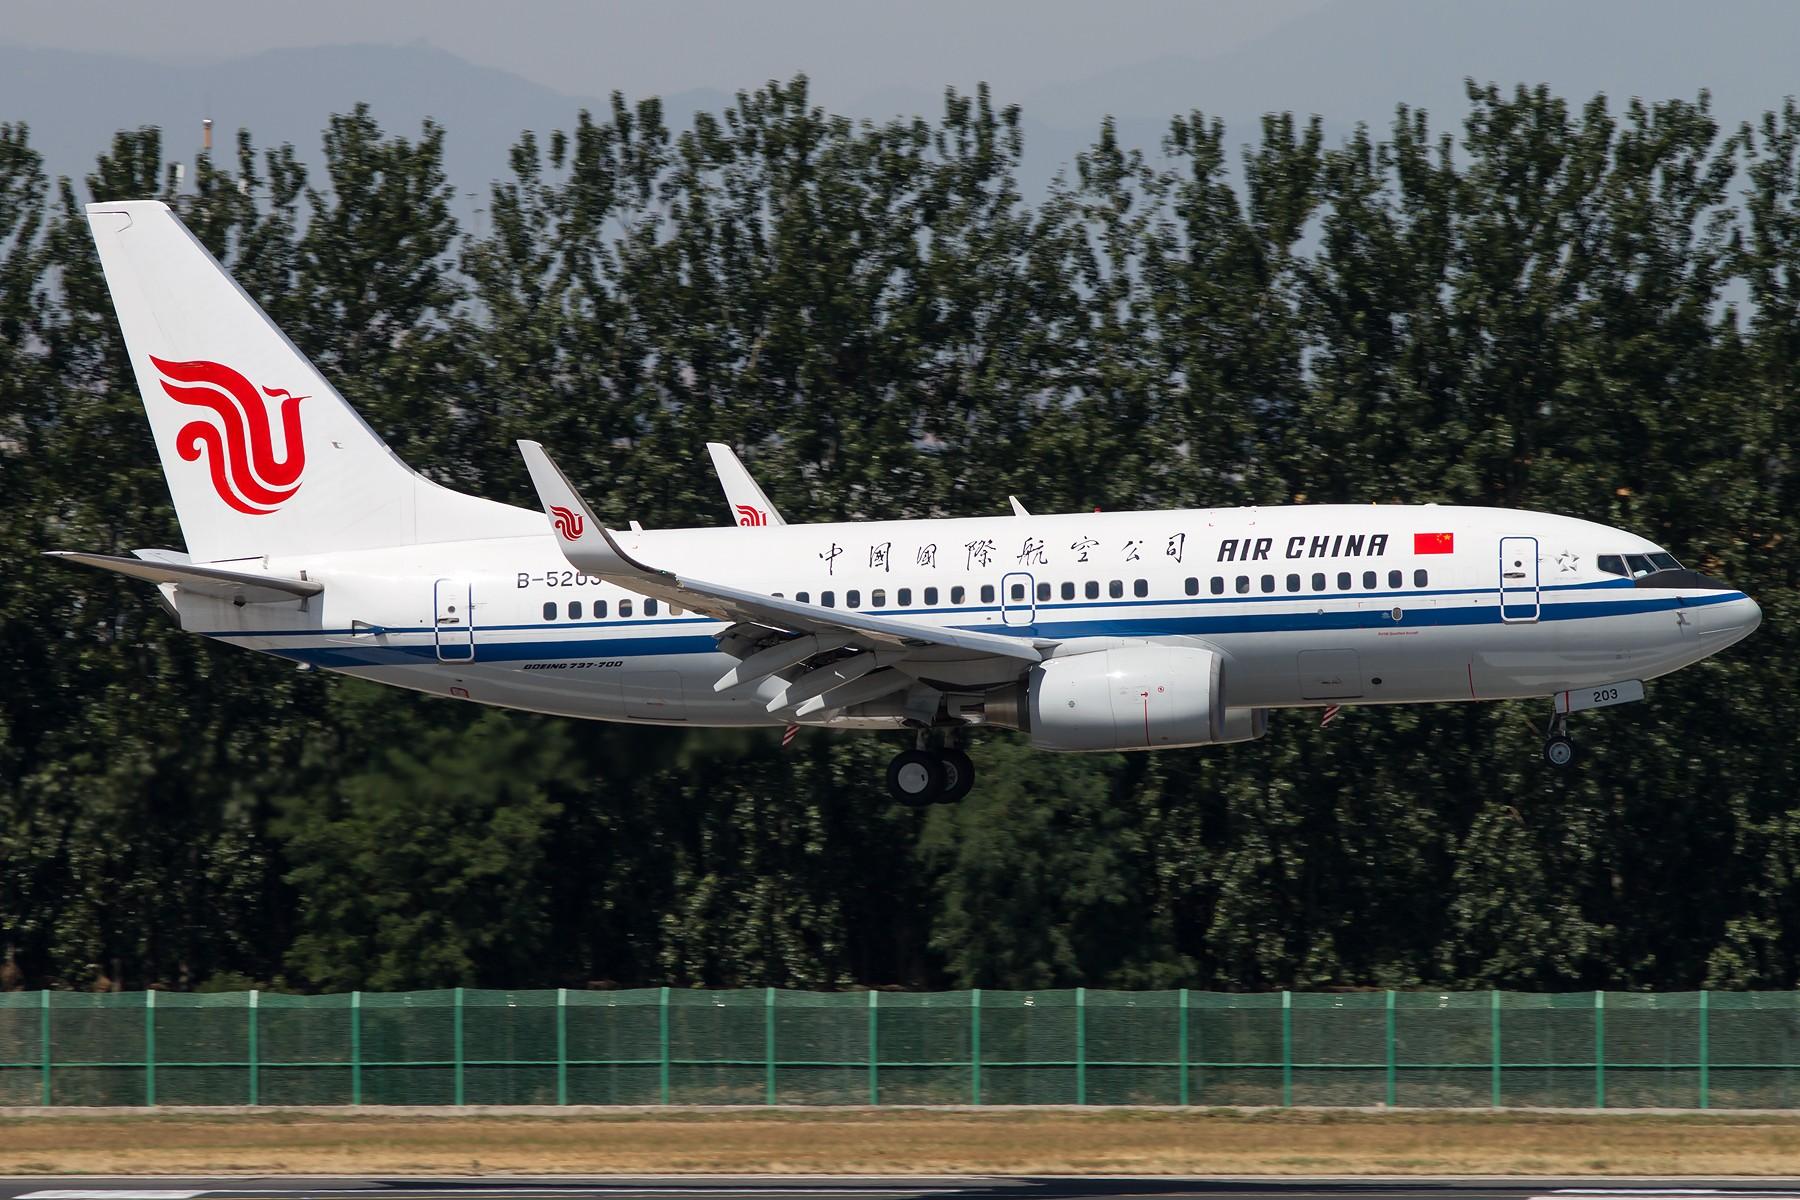 Re:[原创]三大航普通装 1800*1200 [10pics] BOEING 737-700 B-5203 中国北京首都国际机场